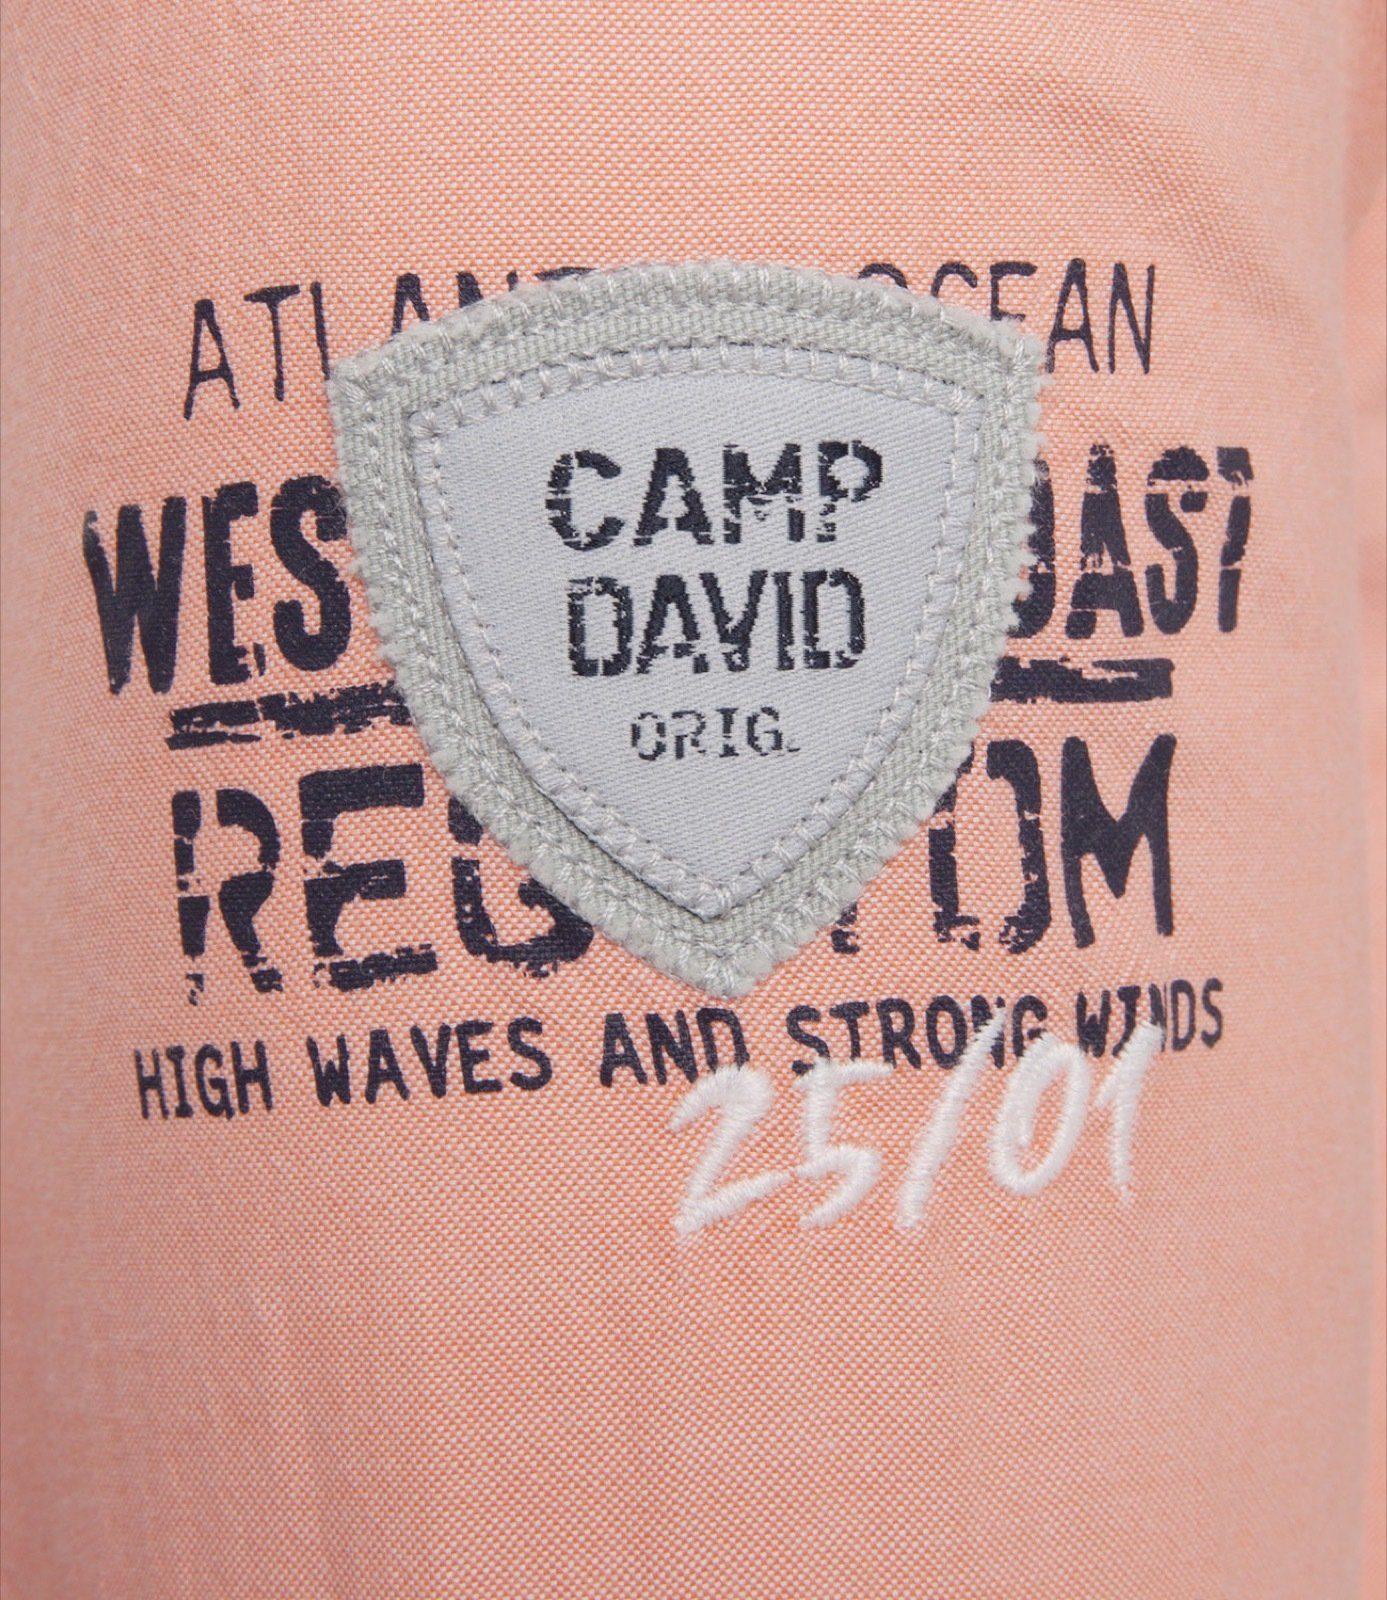 Artwork Online Langarmhemd Camp David Kaufen BsrdthQCxo